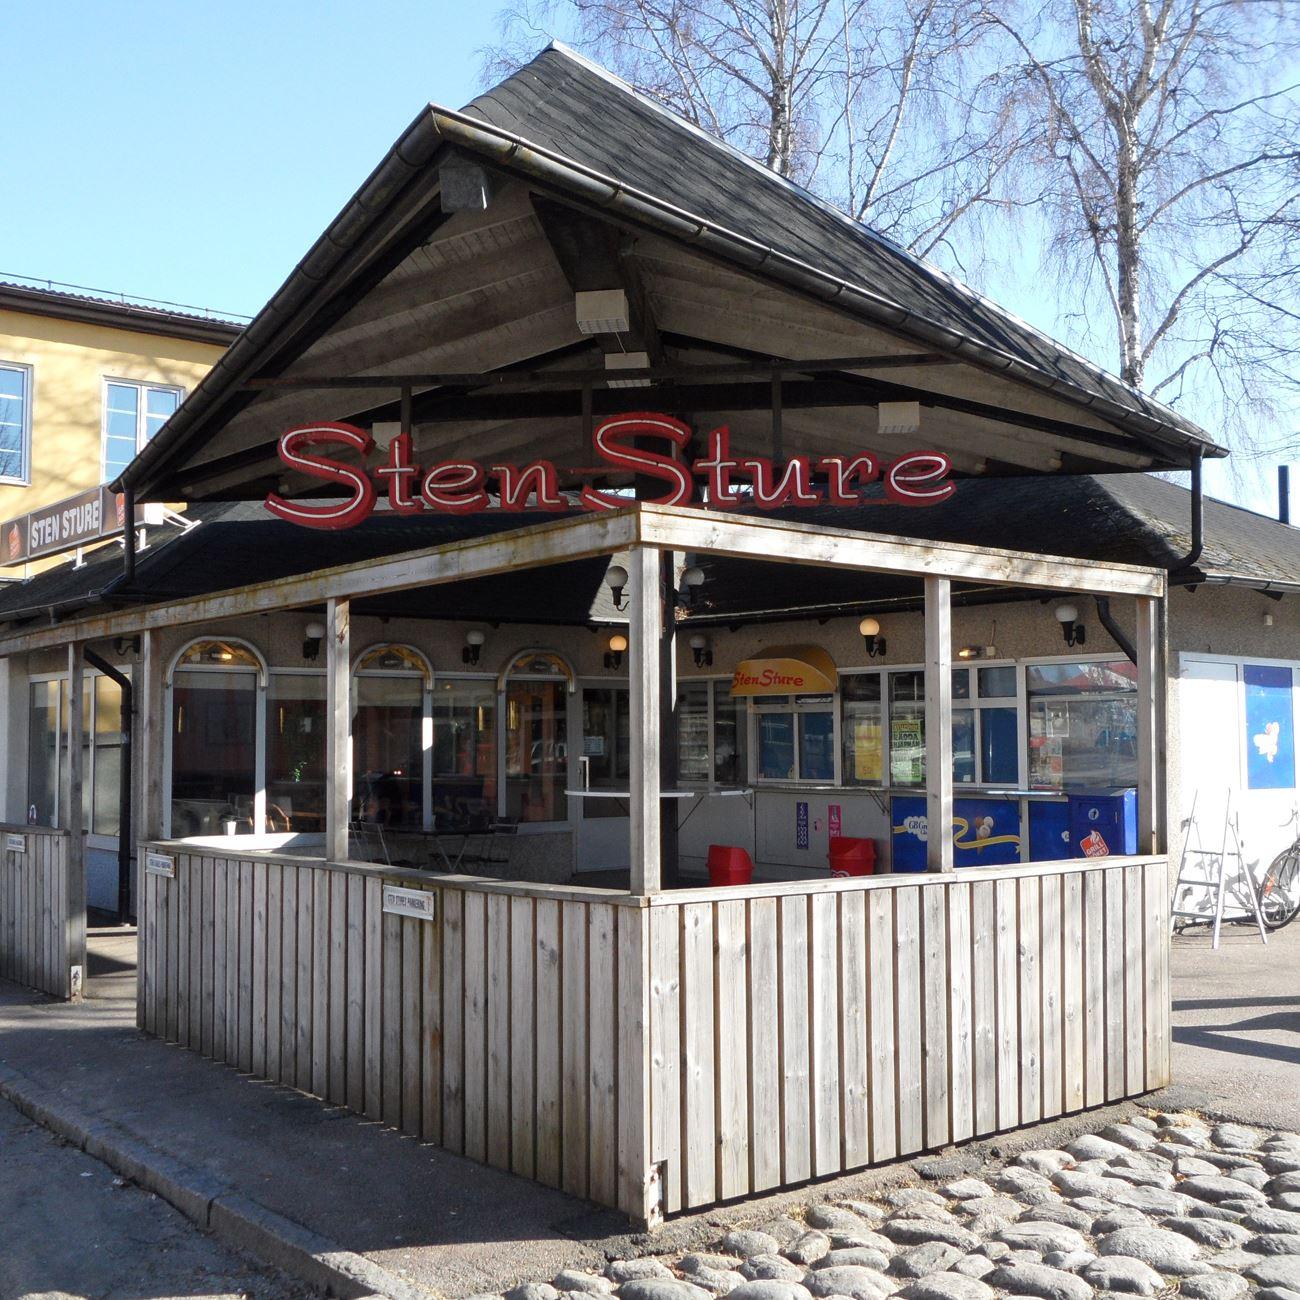 © Värnamo Näringsliv AB , Sten Stures Fastfood